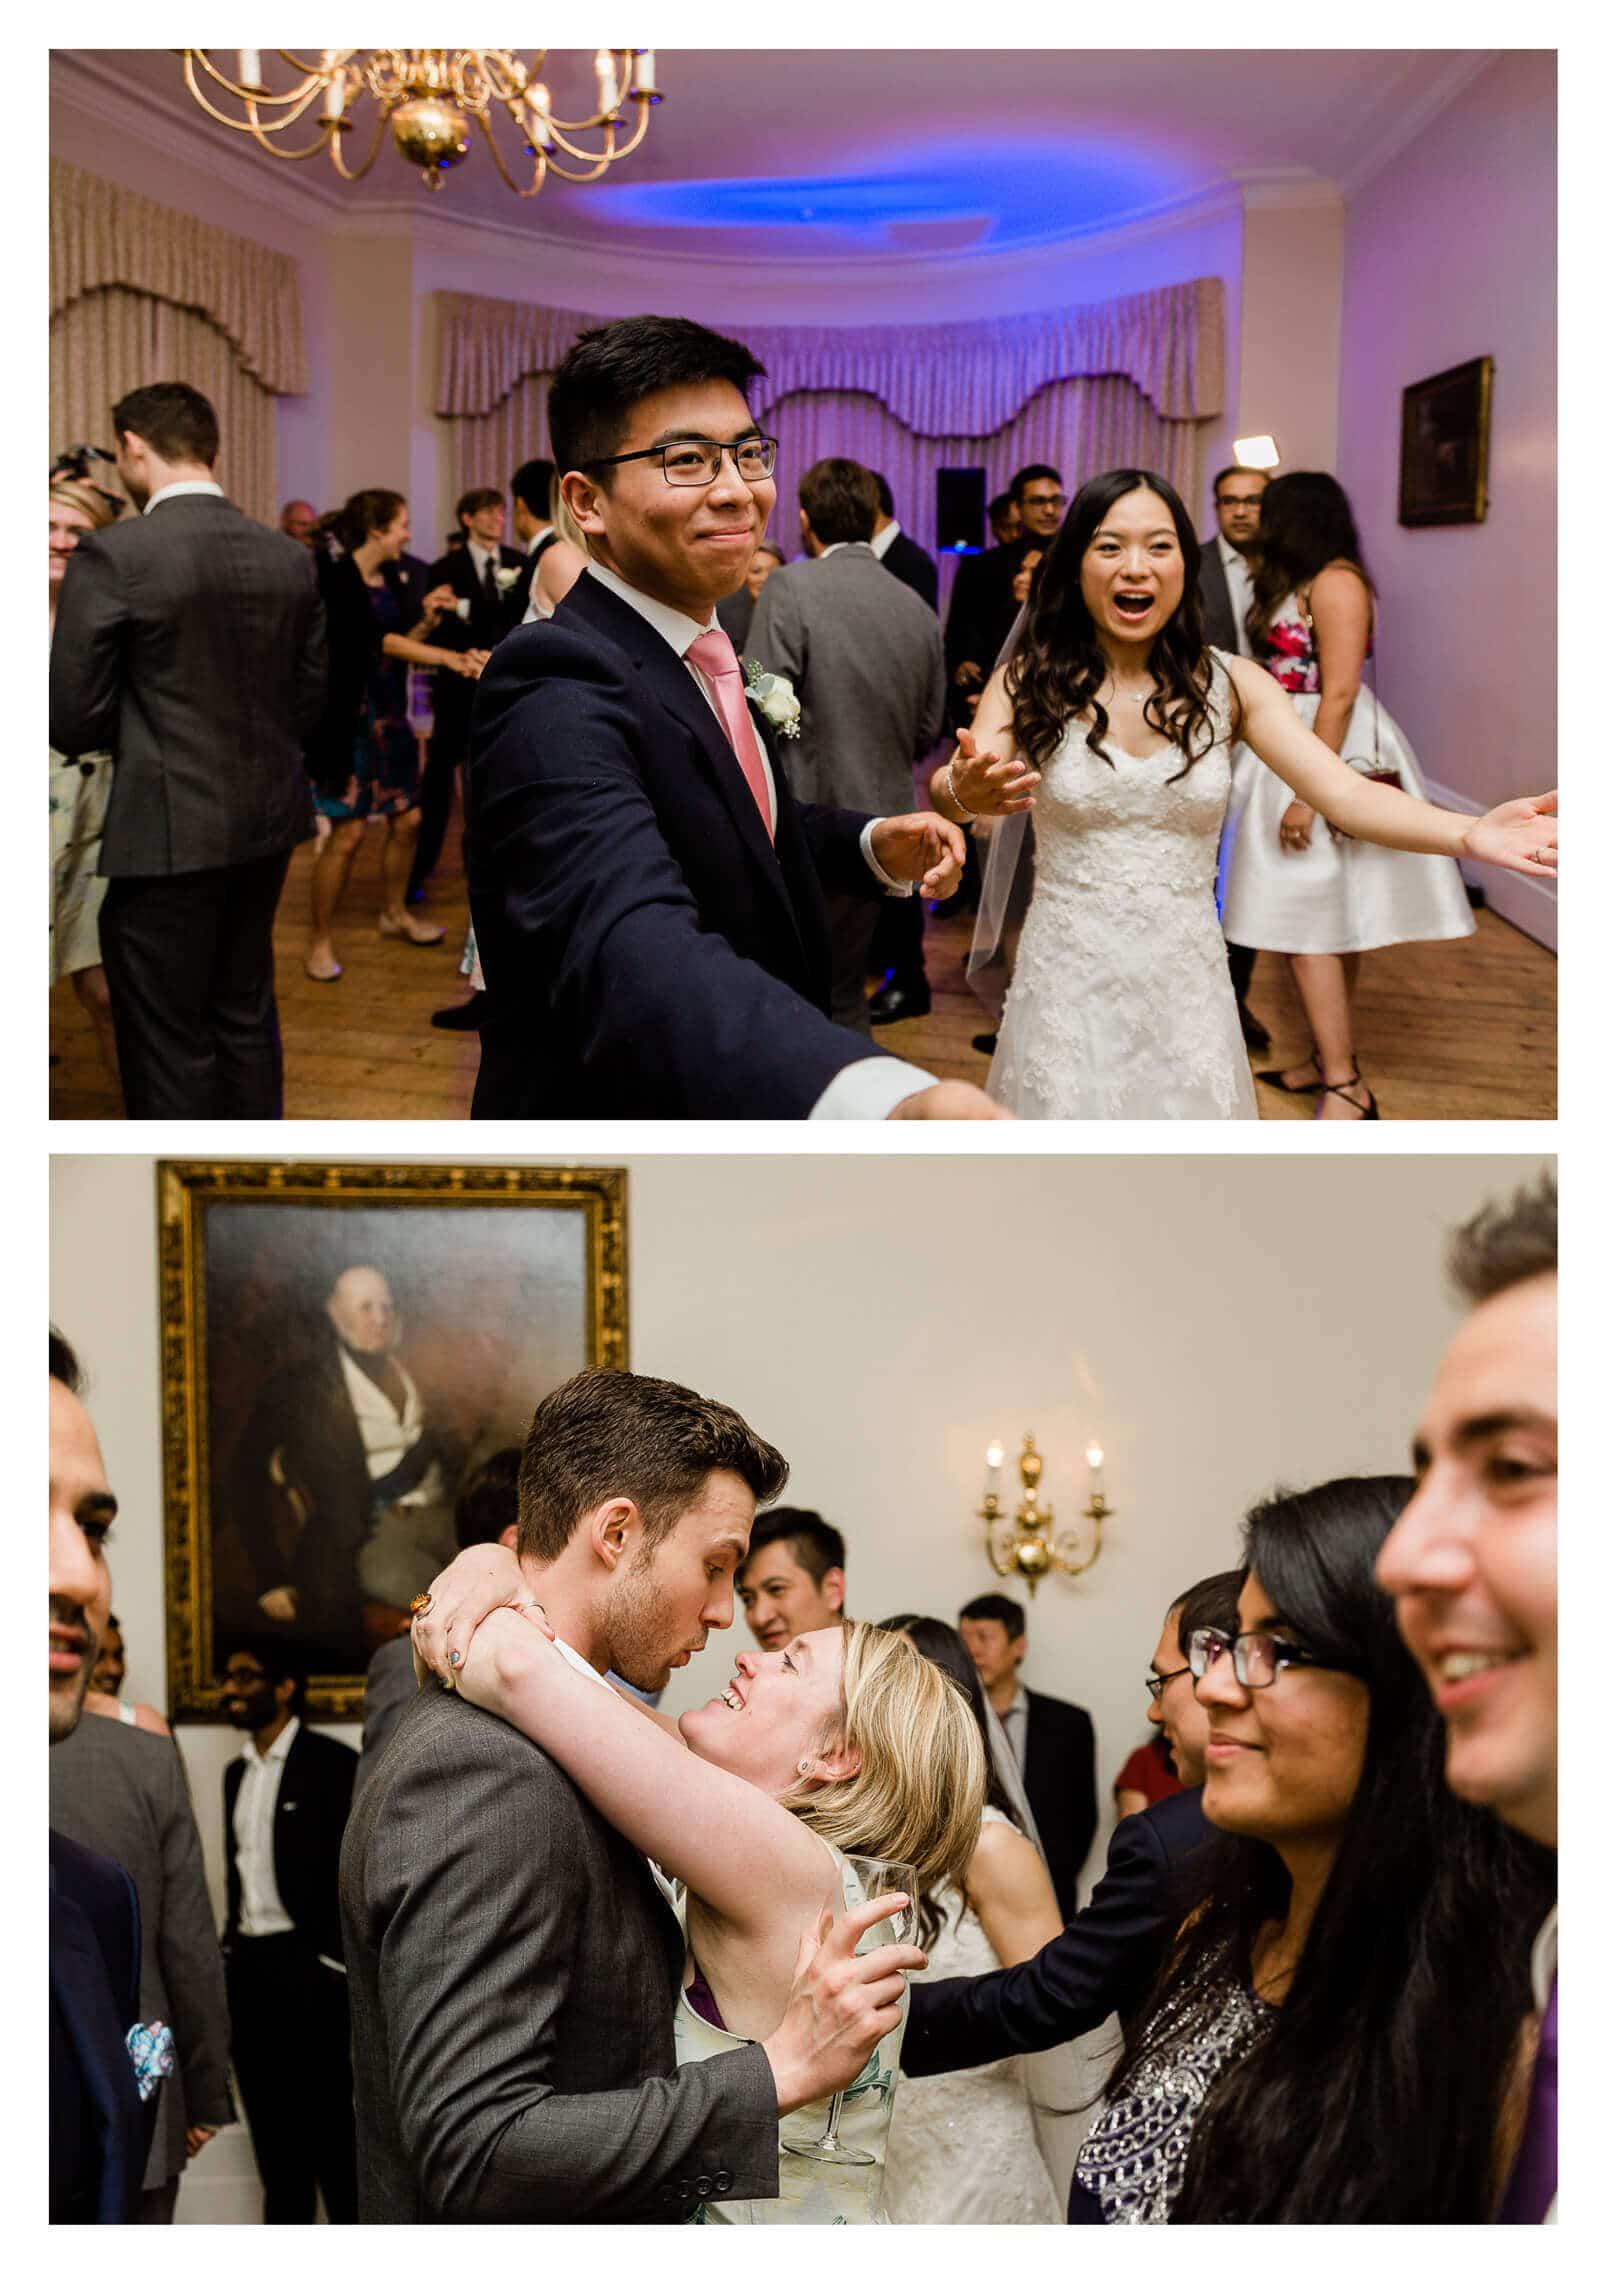 Cambridge Cottage wedding disco | Kew Gardens wedding photographer